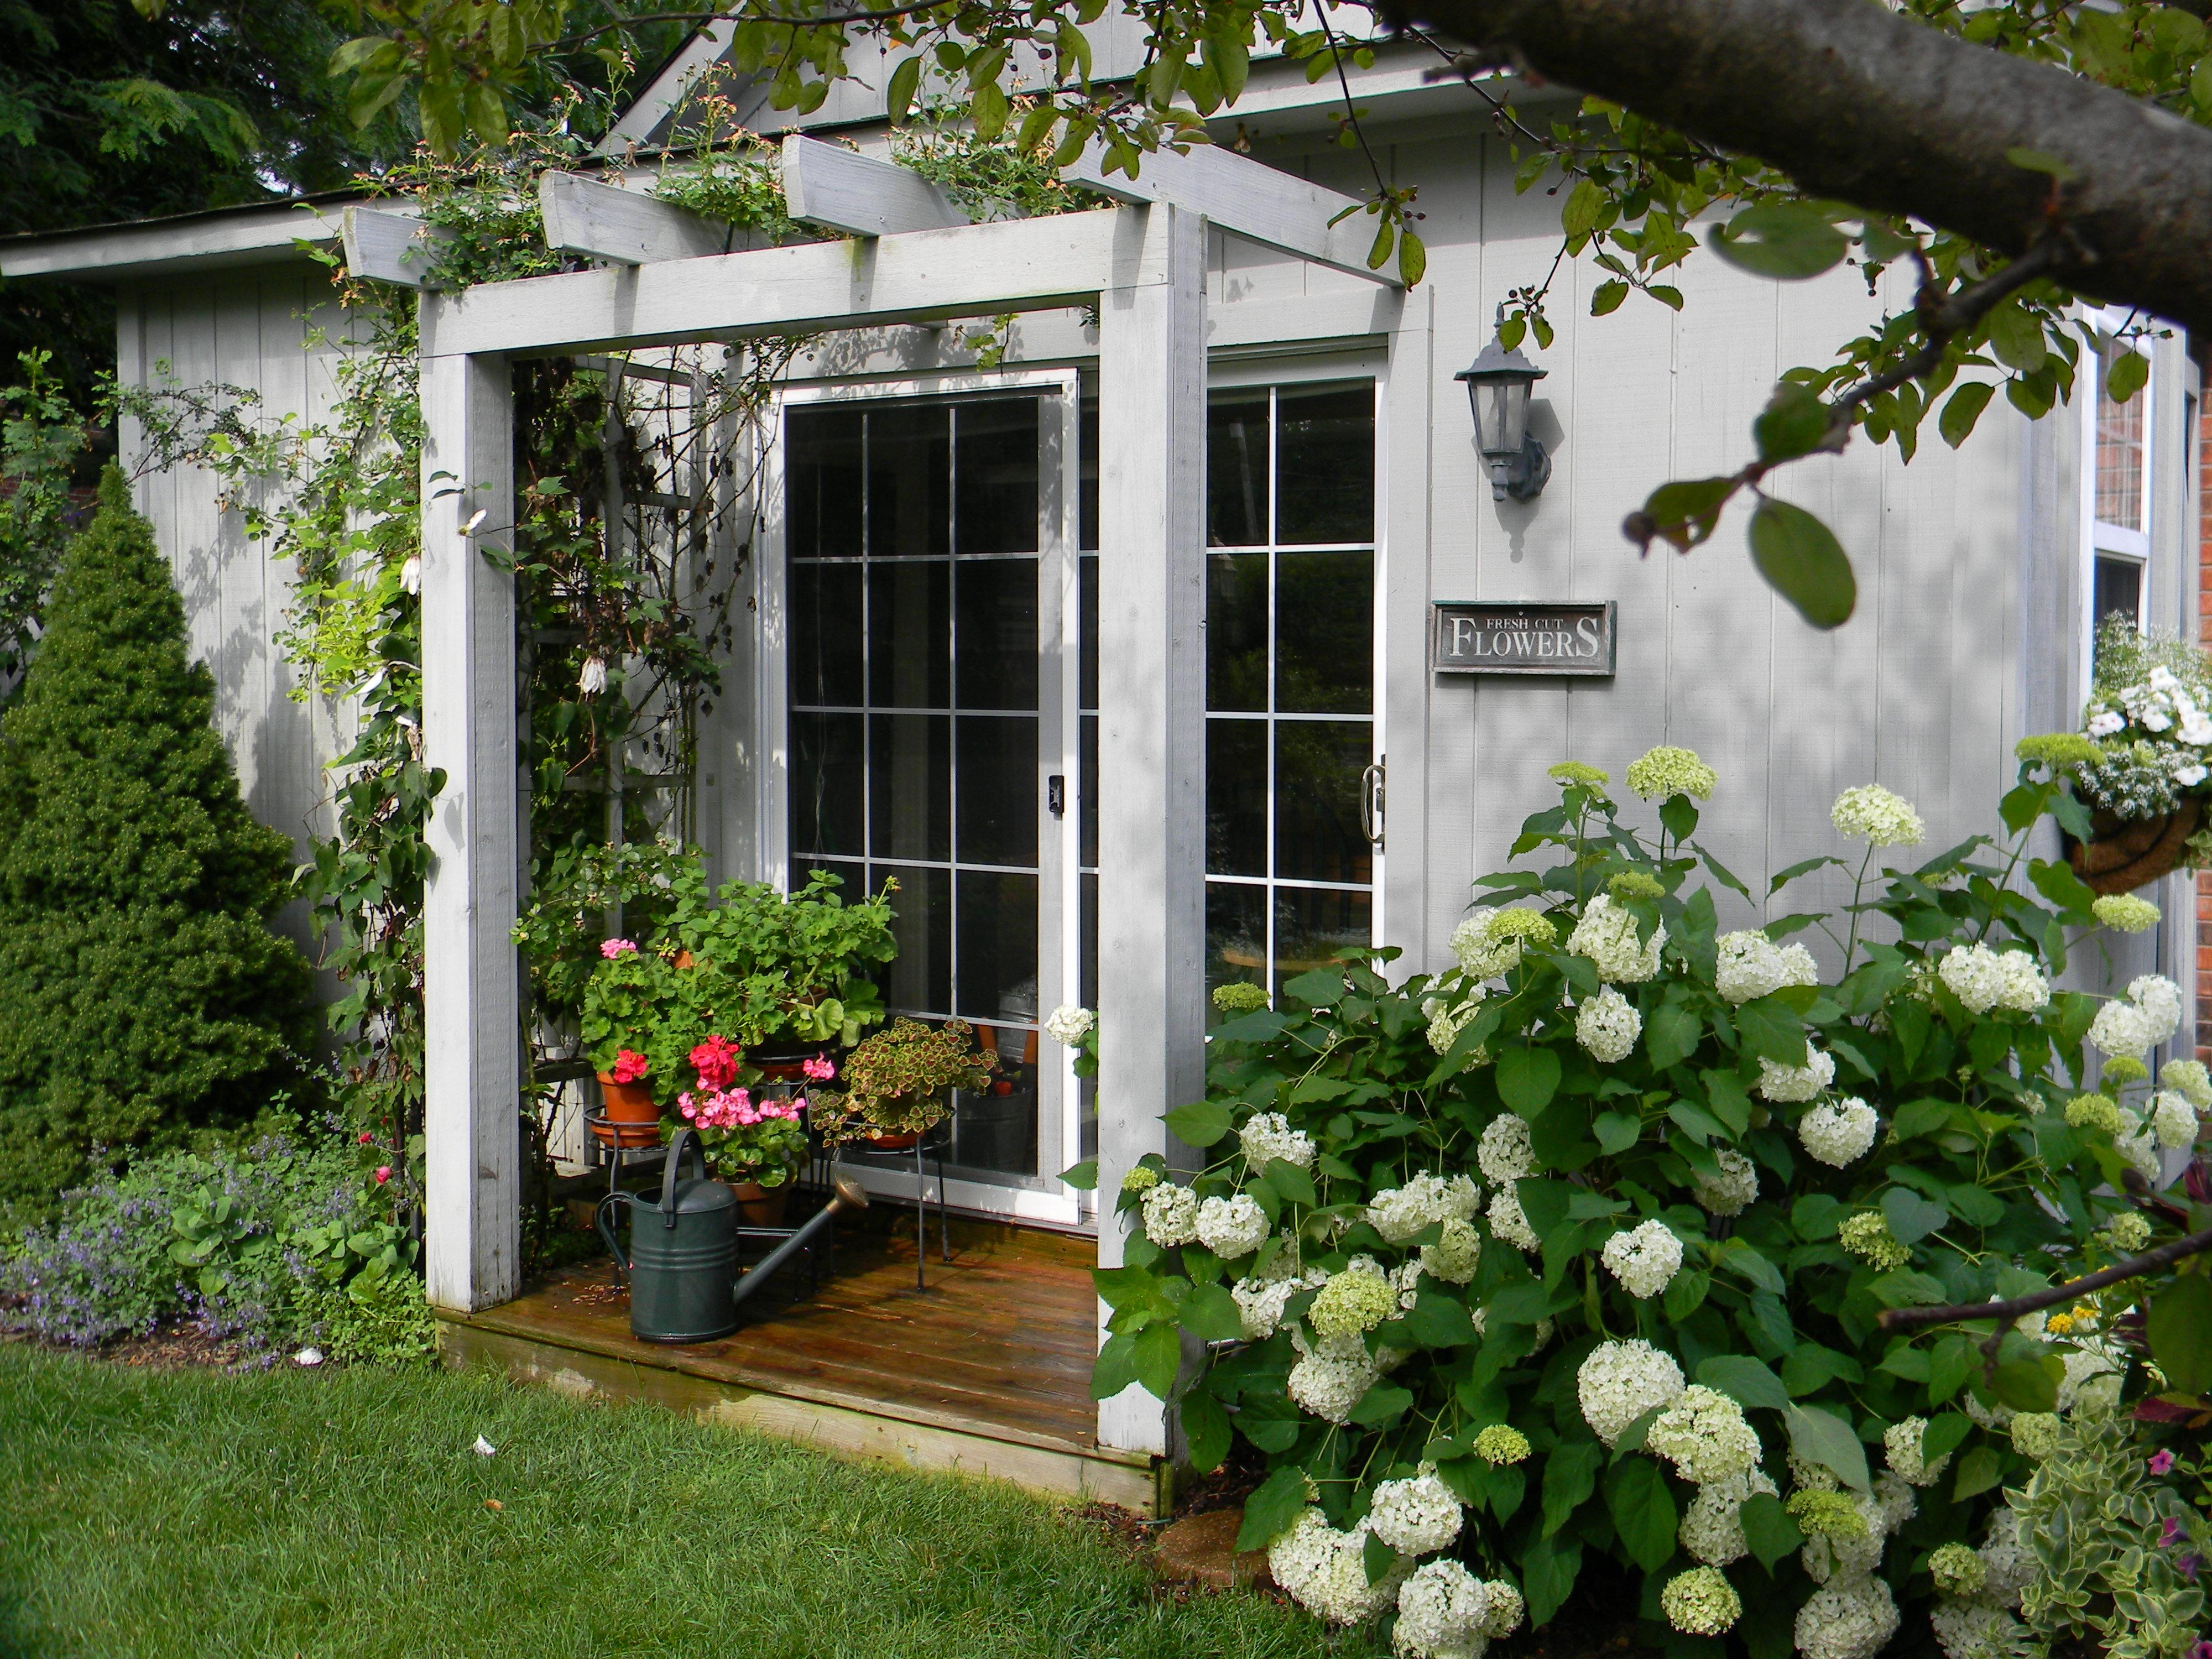 standard sheds houses beaminster green sizes potting